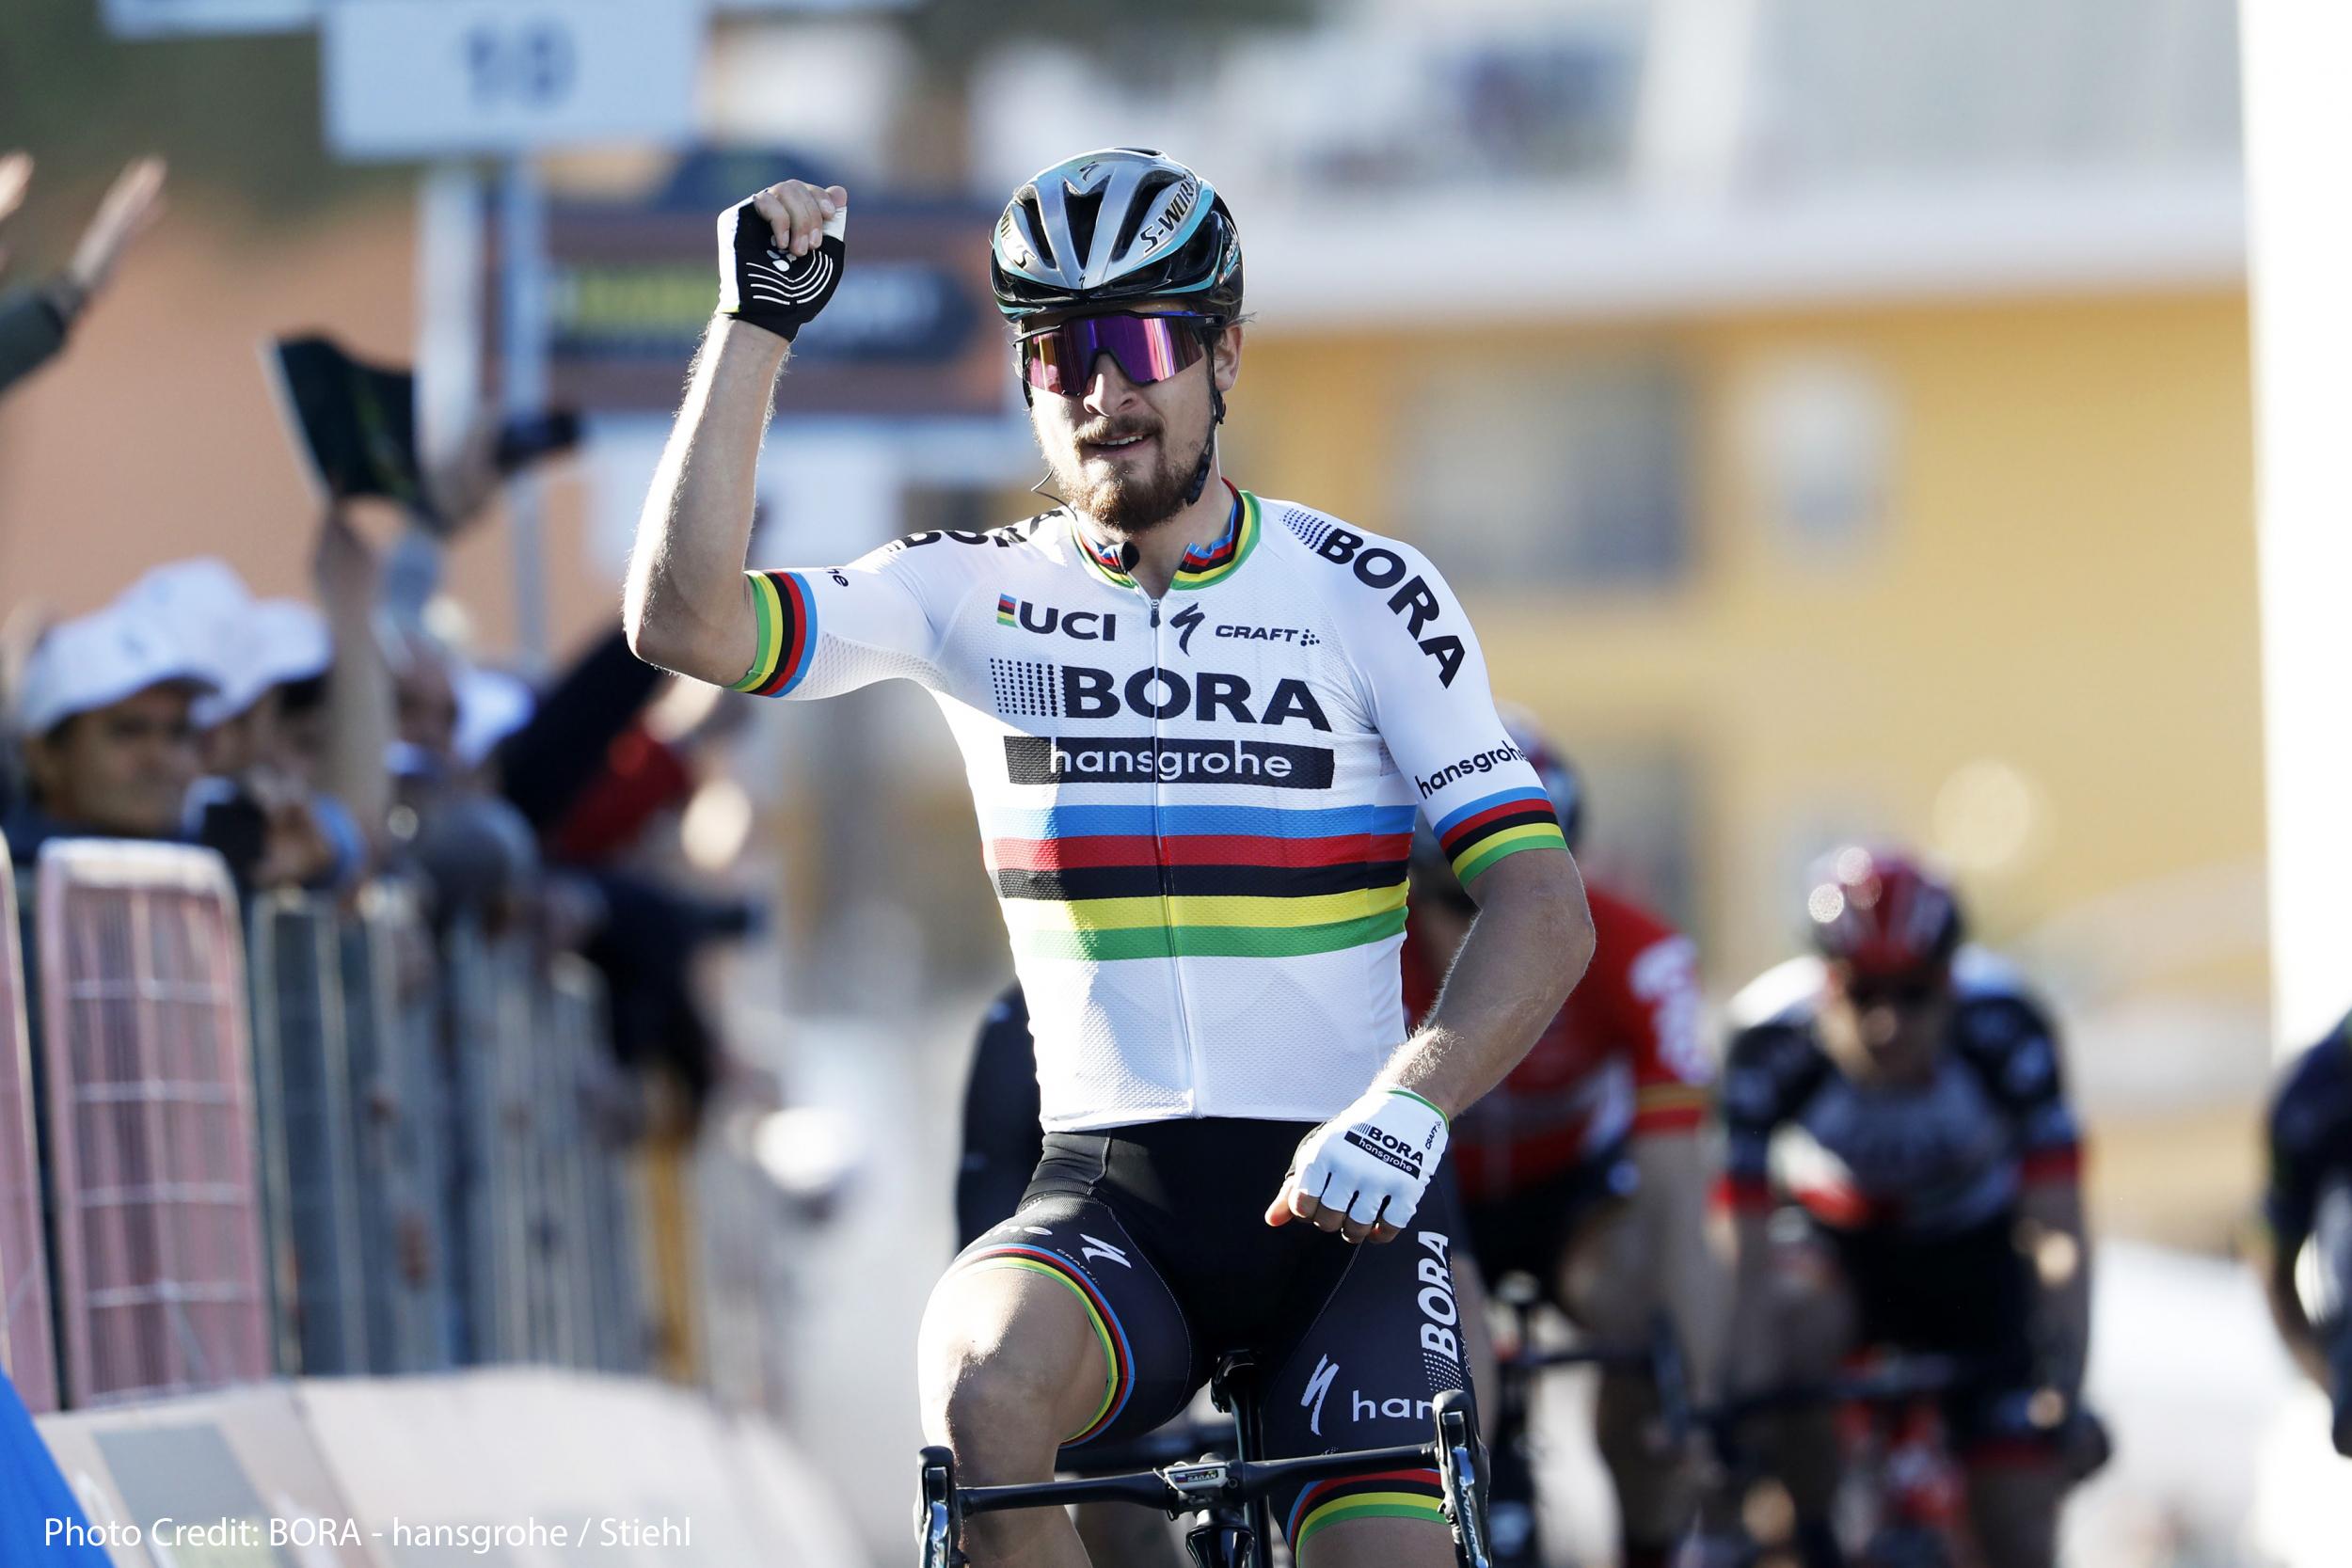 Sagan_Peter_Wins_Tirreno_Adriatico_stage_2017